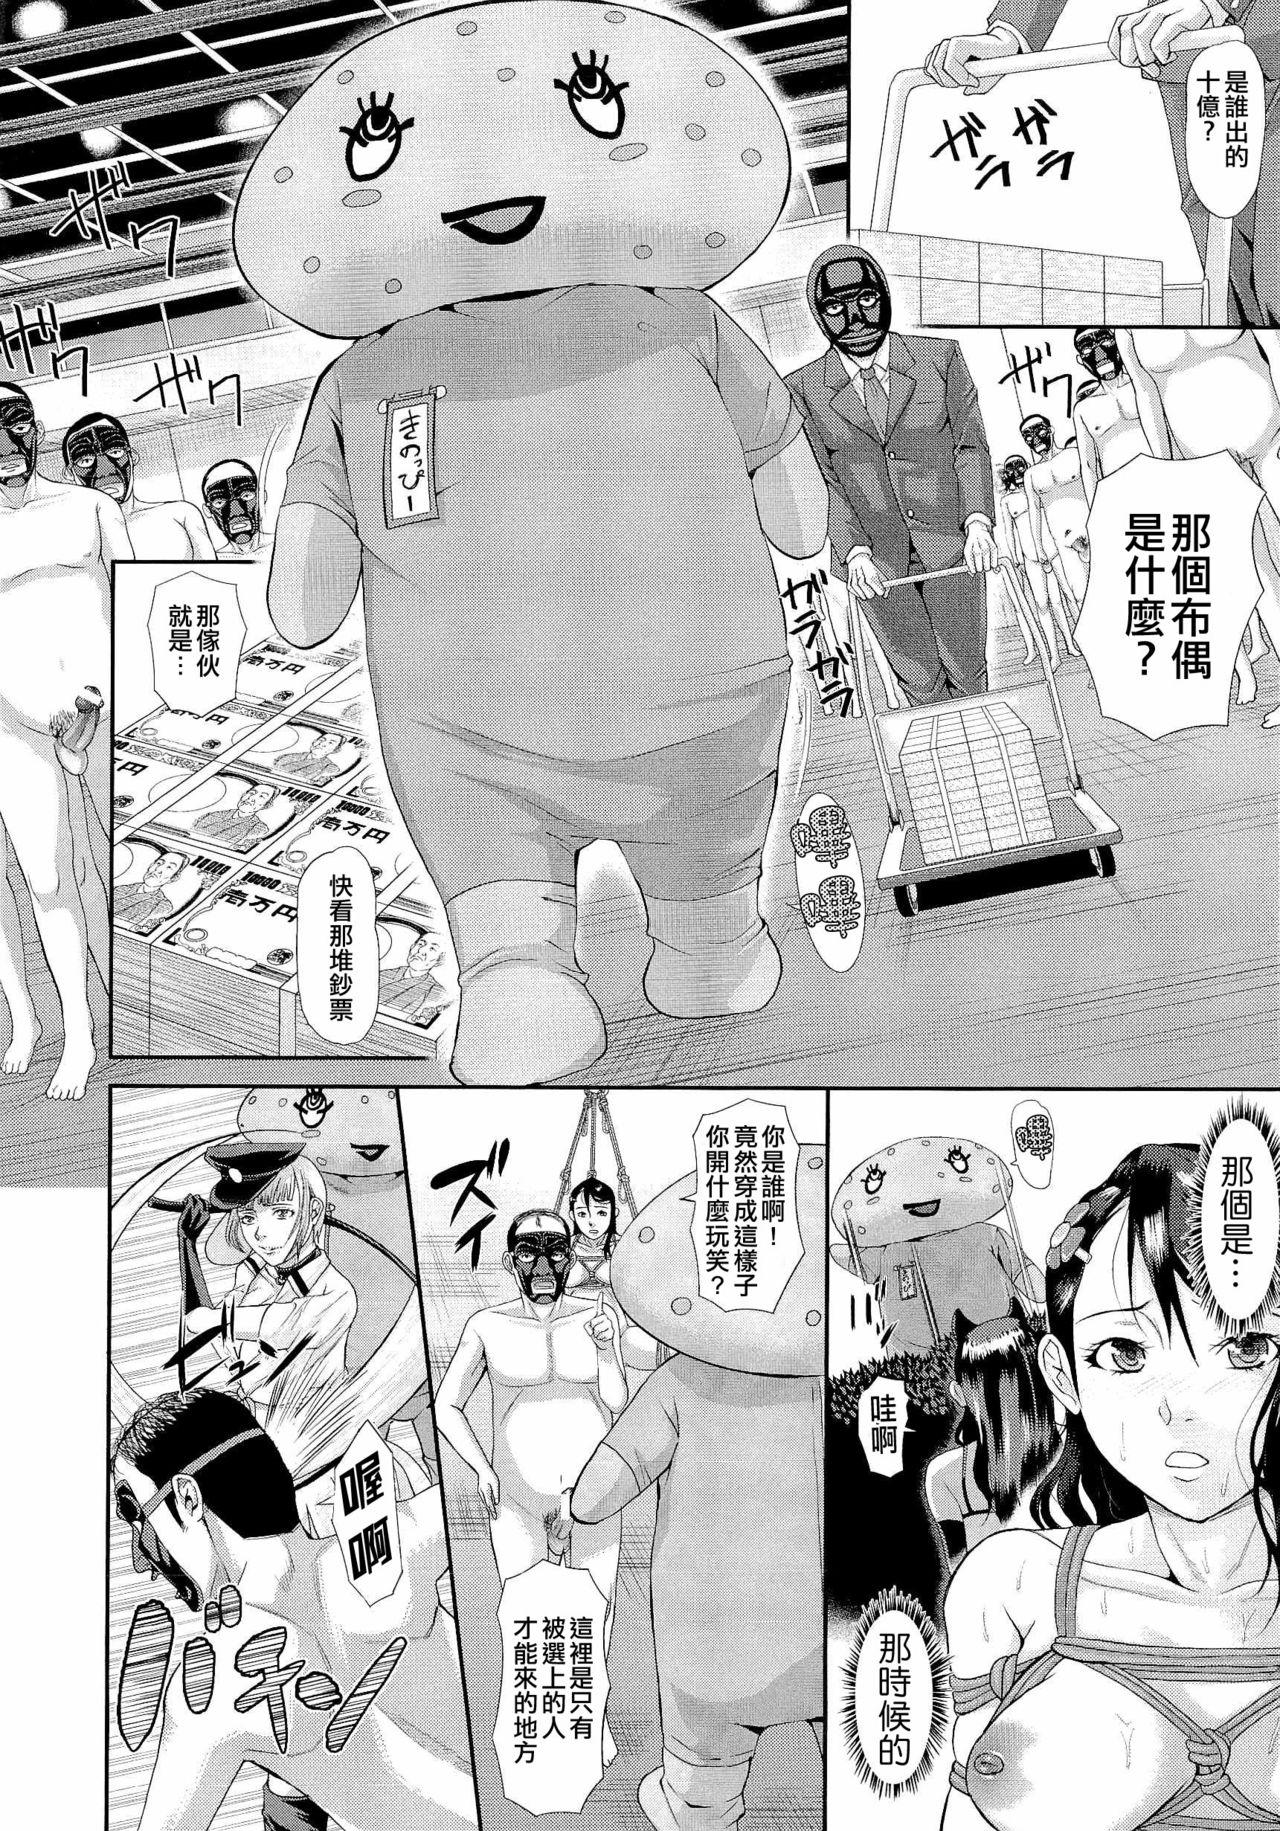 [Honebuto Danshaku] Innou Kaizou Program ~Oyako Zecchou Cult Ochi~ [Chinese]【不想记名重嵌--高质量图源】 192